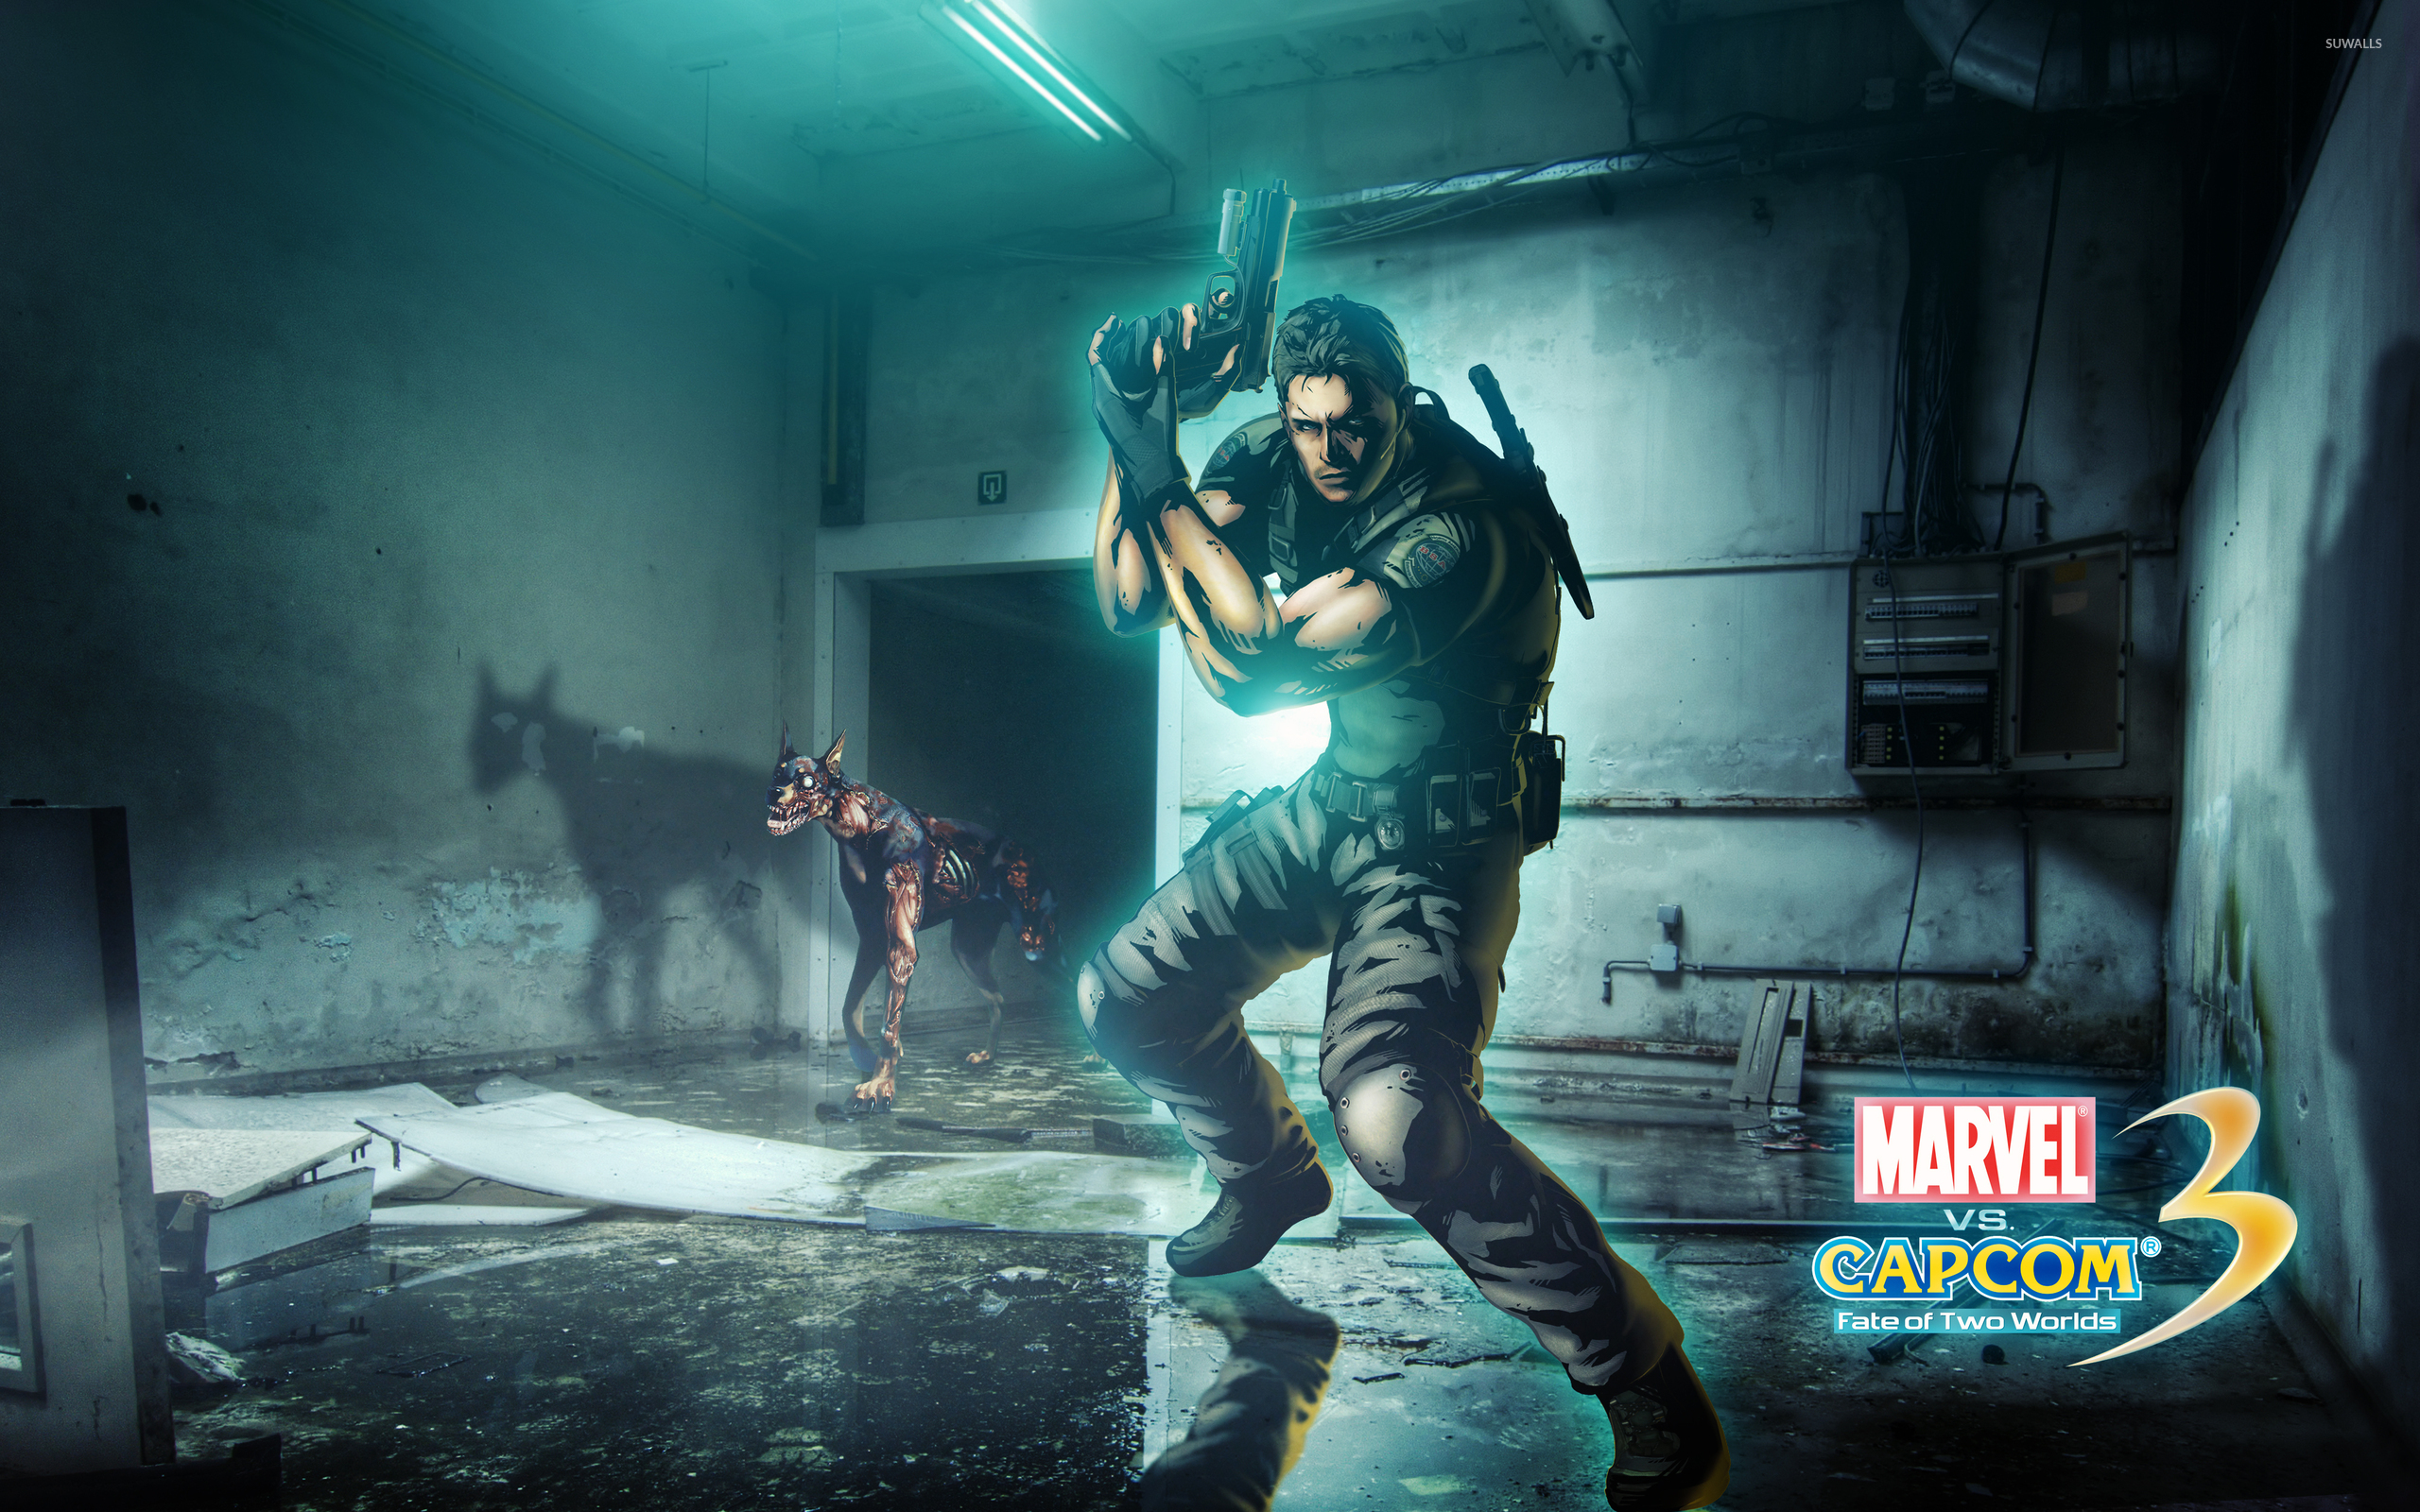 Marvel Vs Capcom 3 Chris Redfield Wallpaper Game Wallpapers 2716